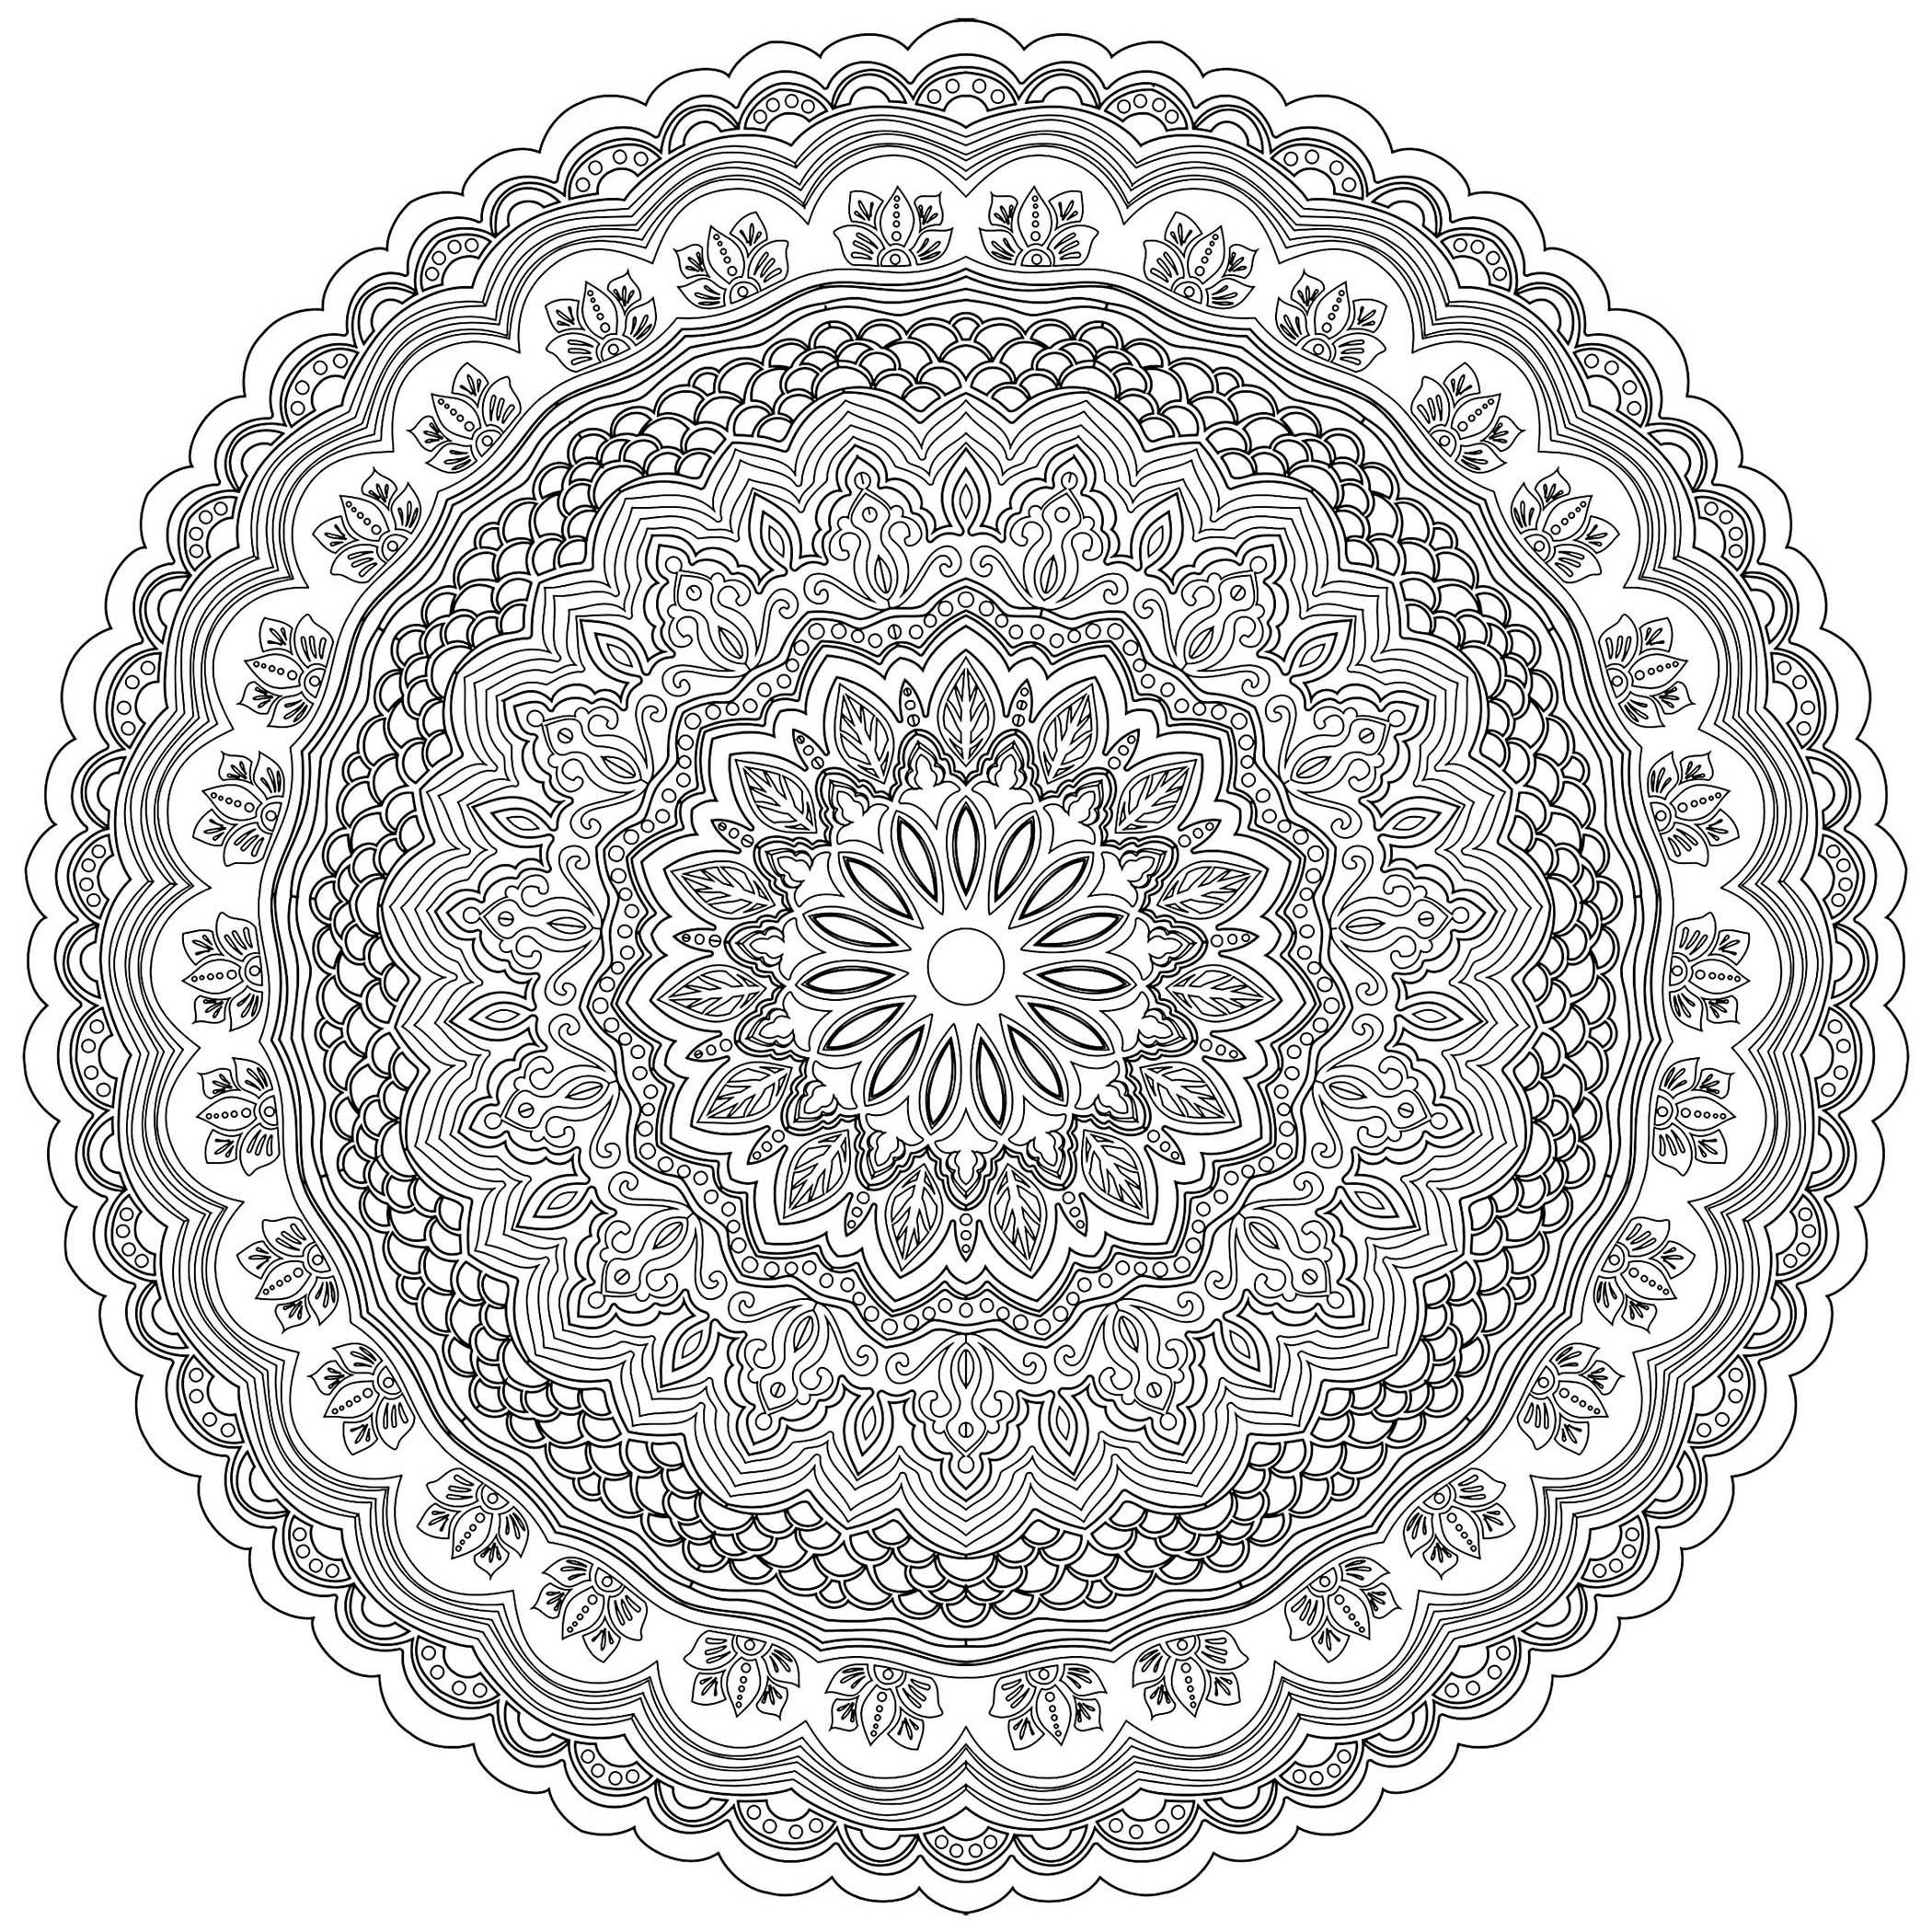 Colorear para Adultos : Mandalas - 3